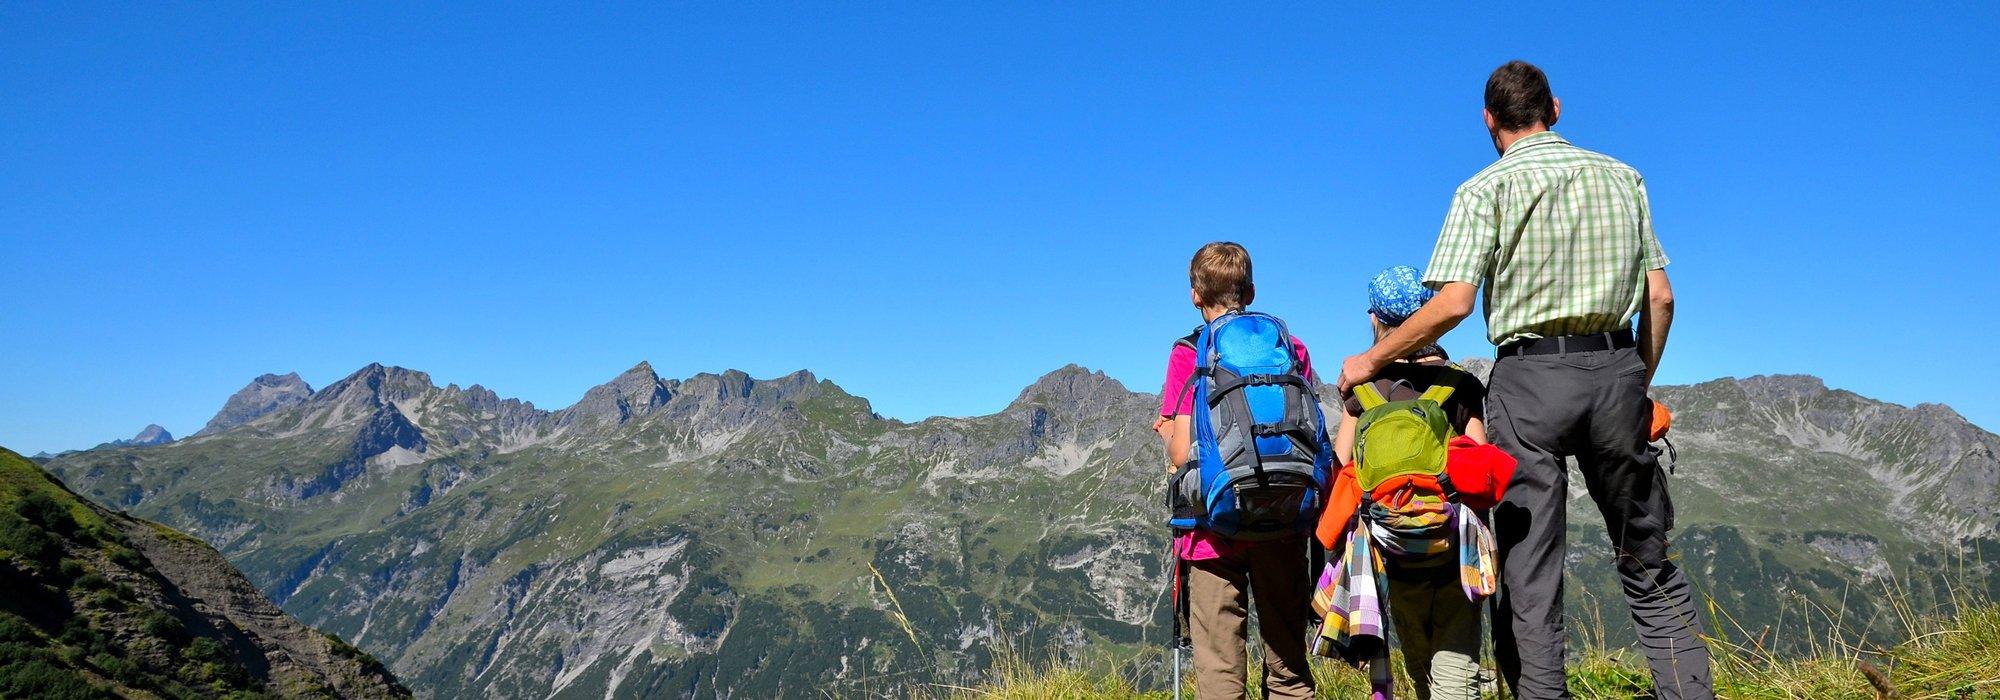 Urlaub im Biohotel Allgäu mit Bergblick | Balderschwang